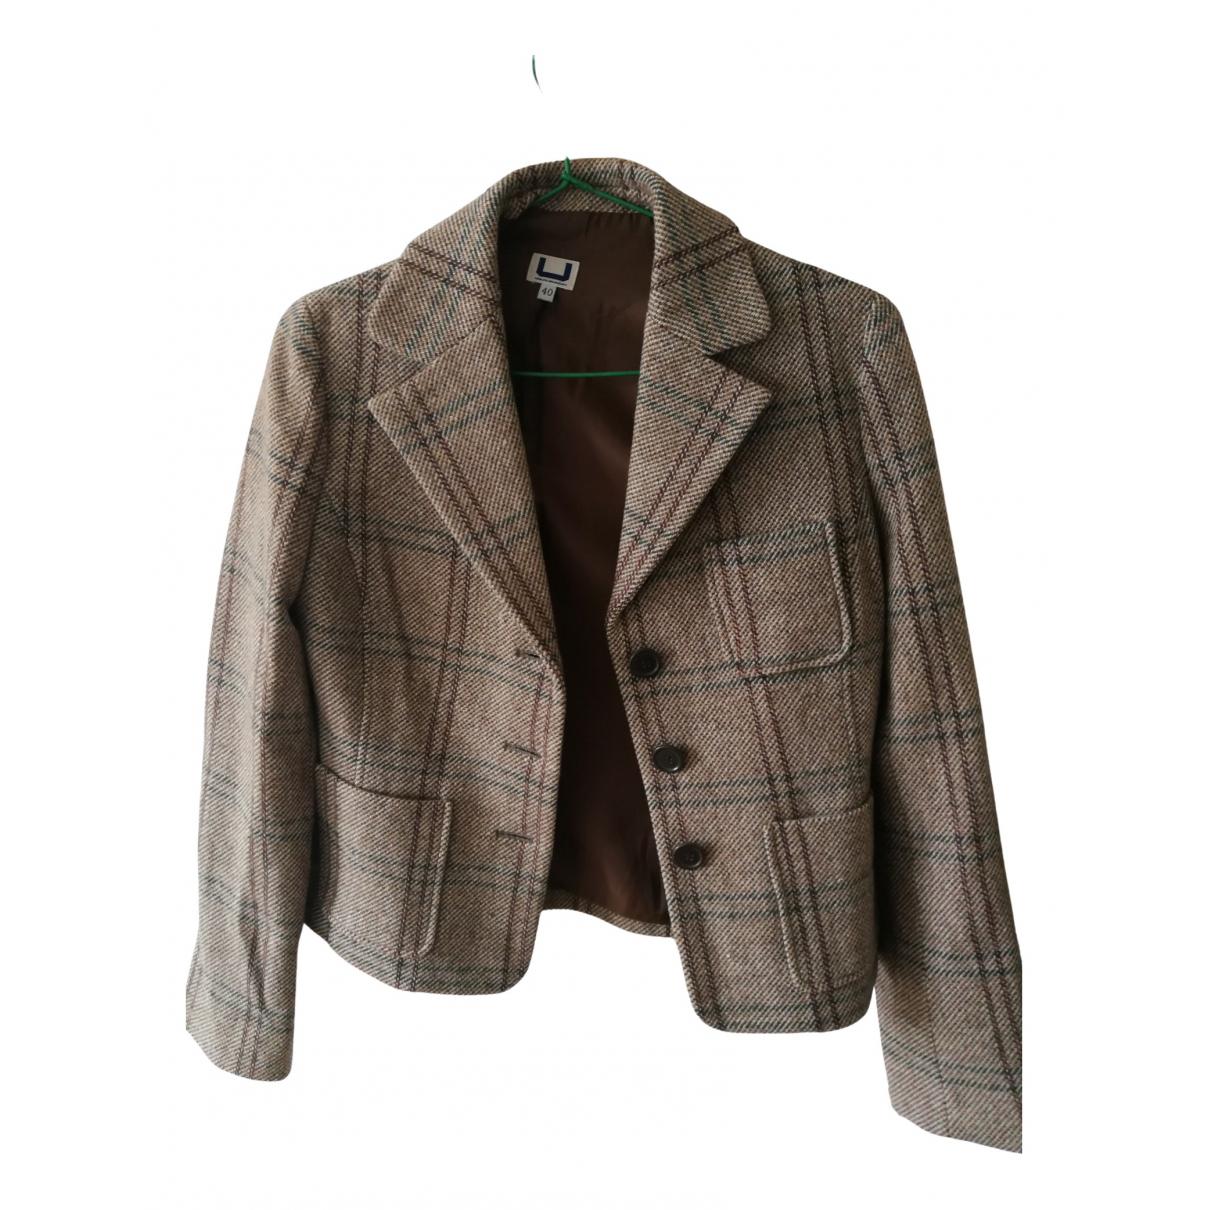 Adolfo Dominguez \N Jacke in  Khaki Wolle